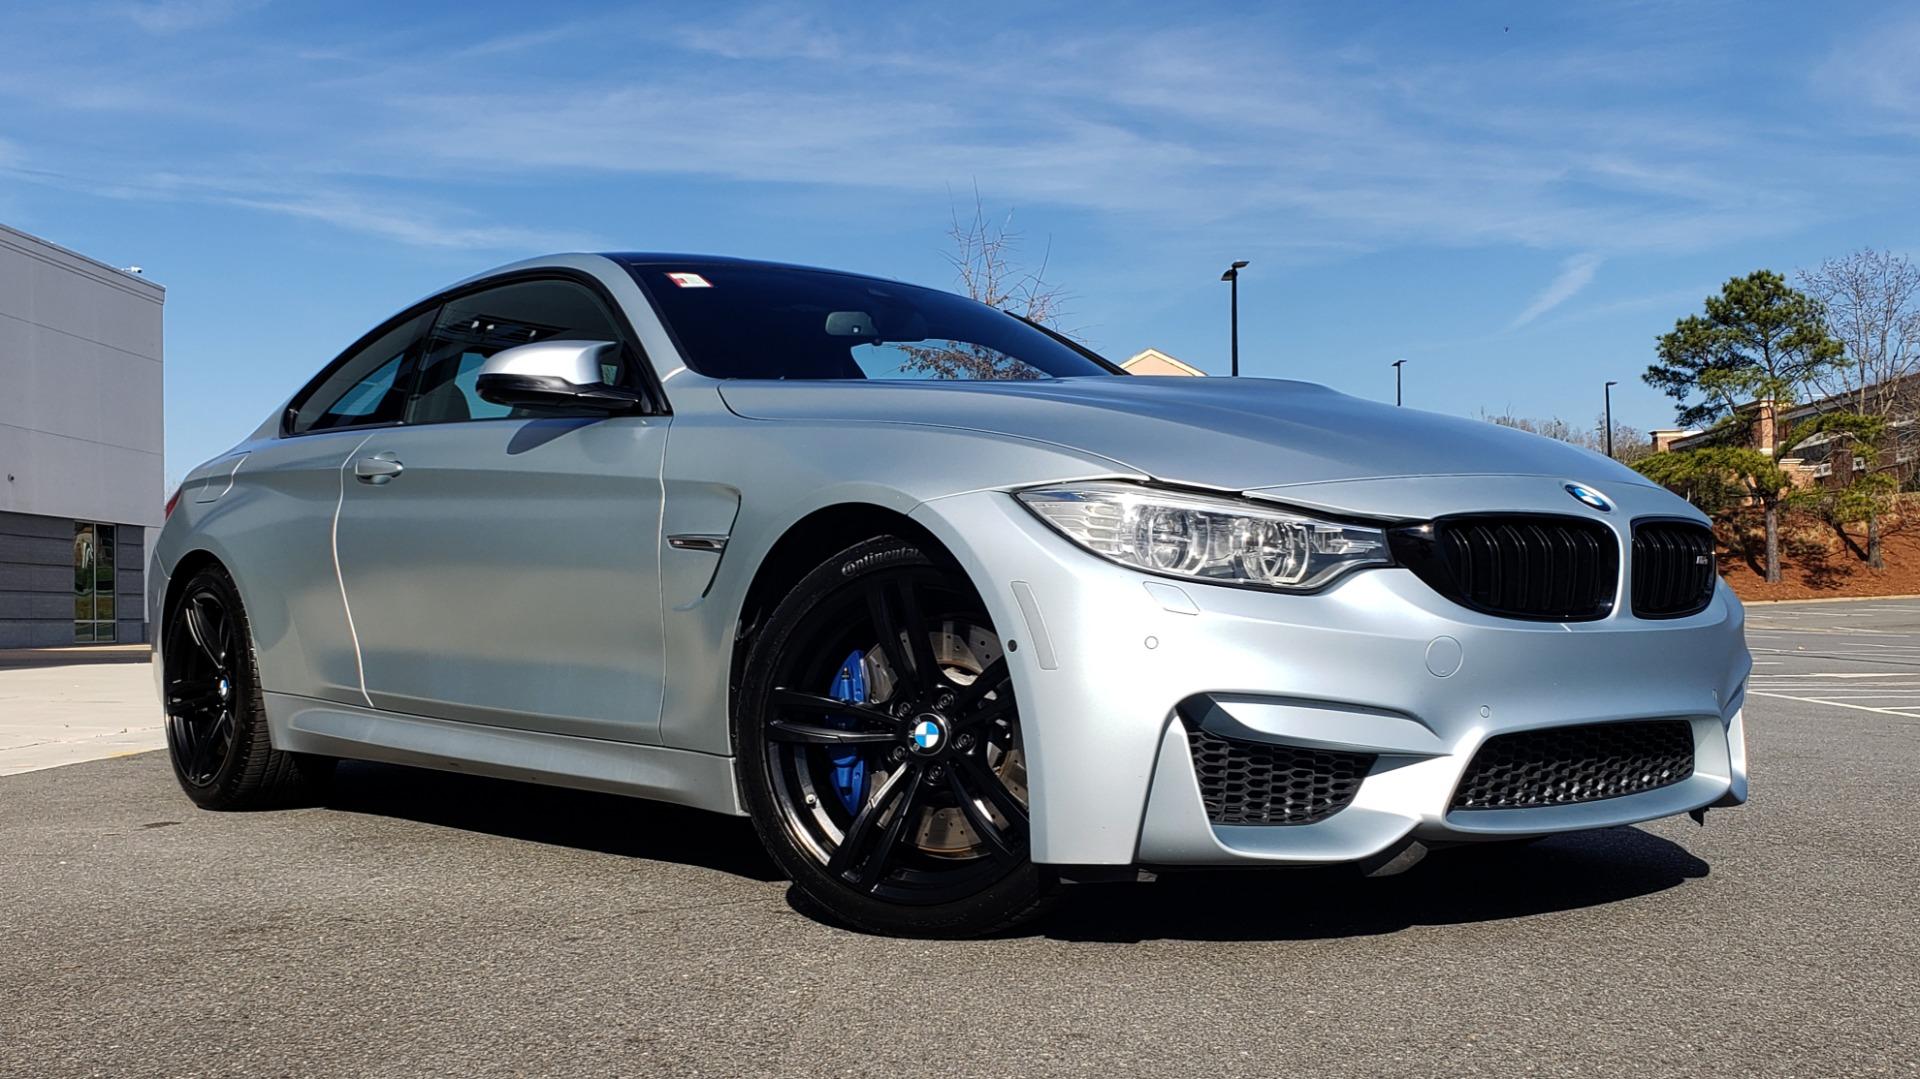 Used 2015 BMW M4 COUPE / EXEC PKG / DRVR ASST PLUS / LIGHTING / M-SUSPENSION for sale Sold at Formula Imports in Charlotte NC 28227 24